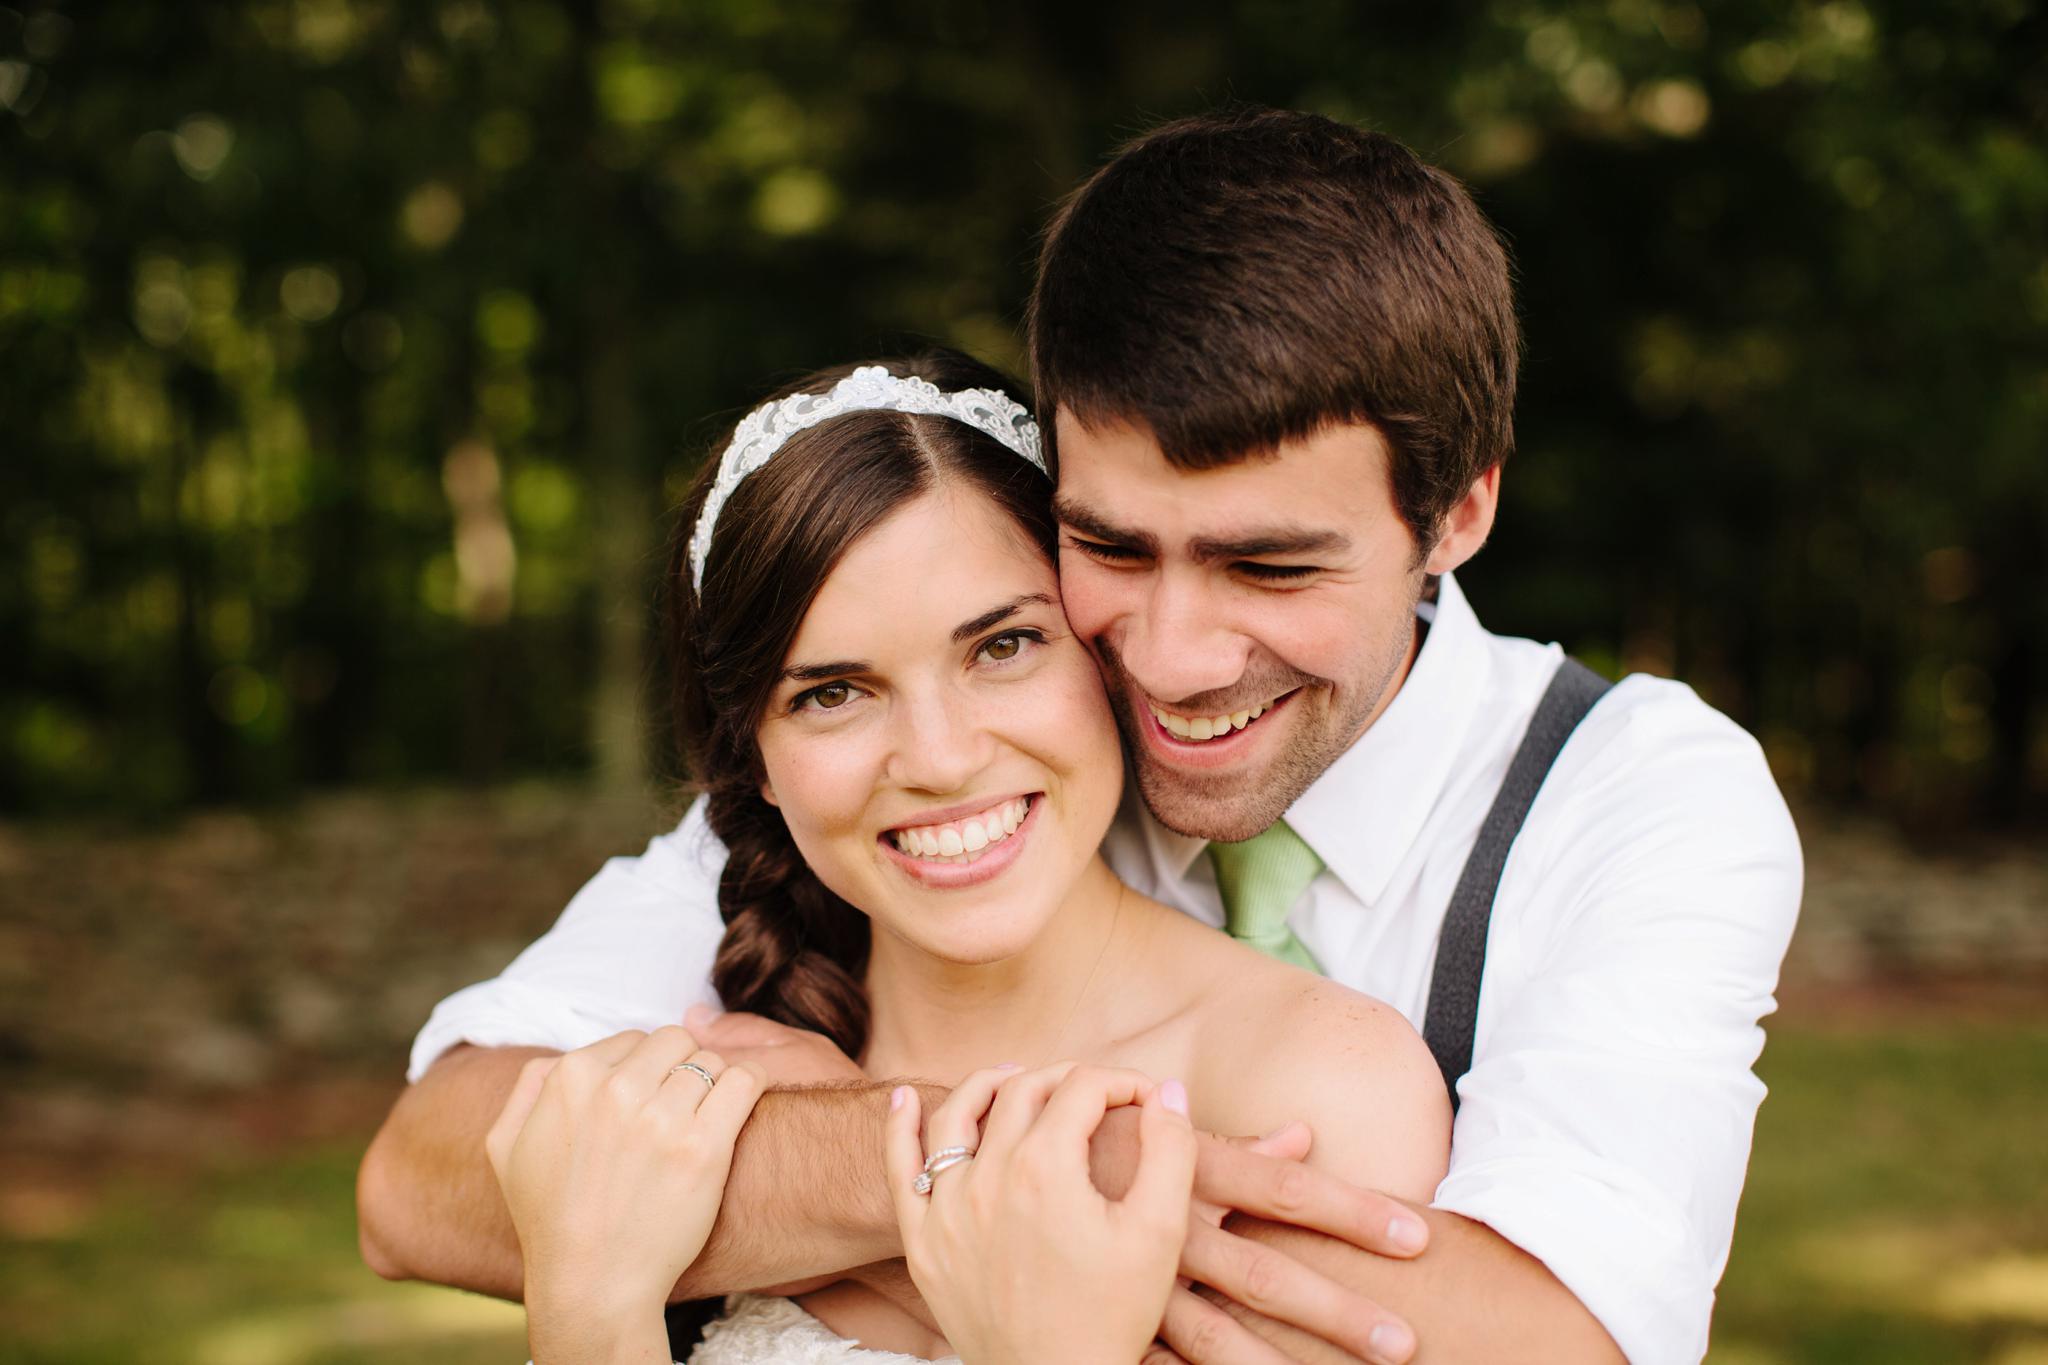 Groom Hugging Bride at Lackawanna State Park Wedding Photos Backyard Wedding DIY Ideas Scranton PA Wedding Photographer